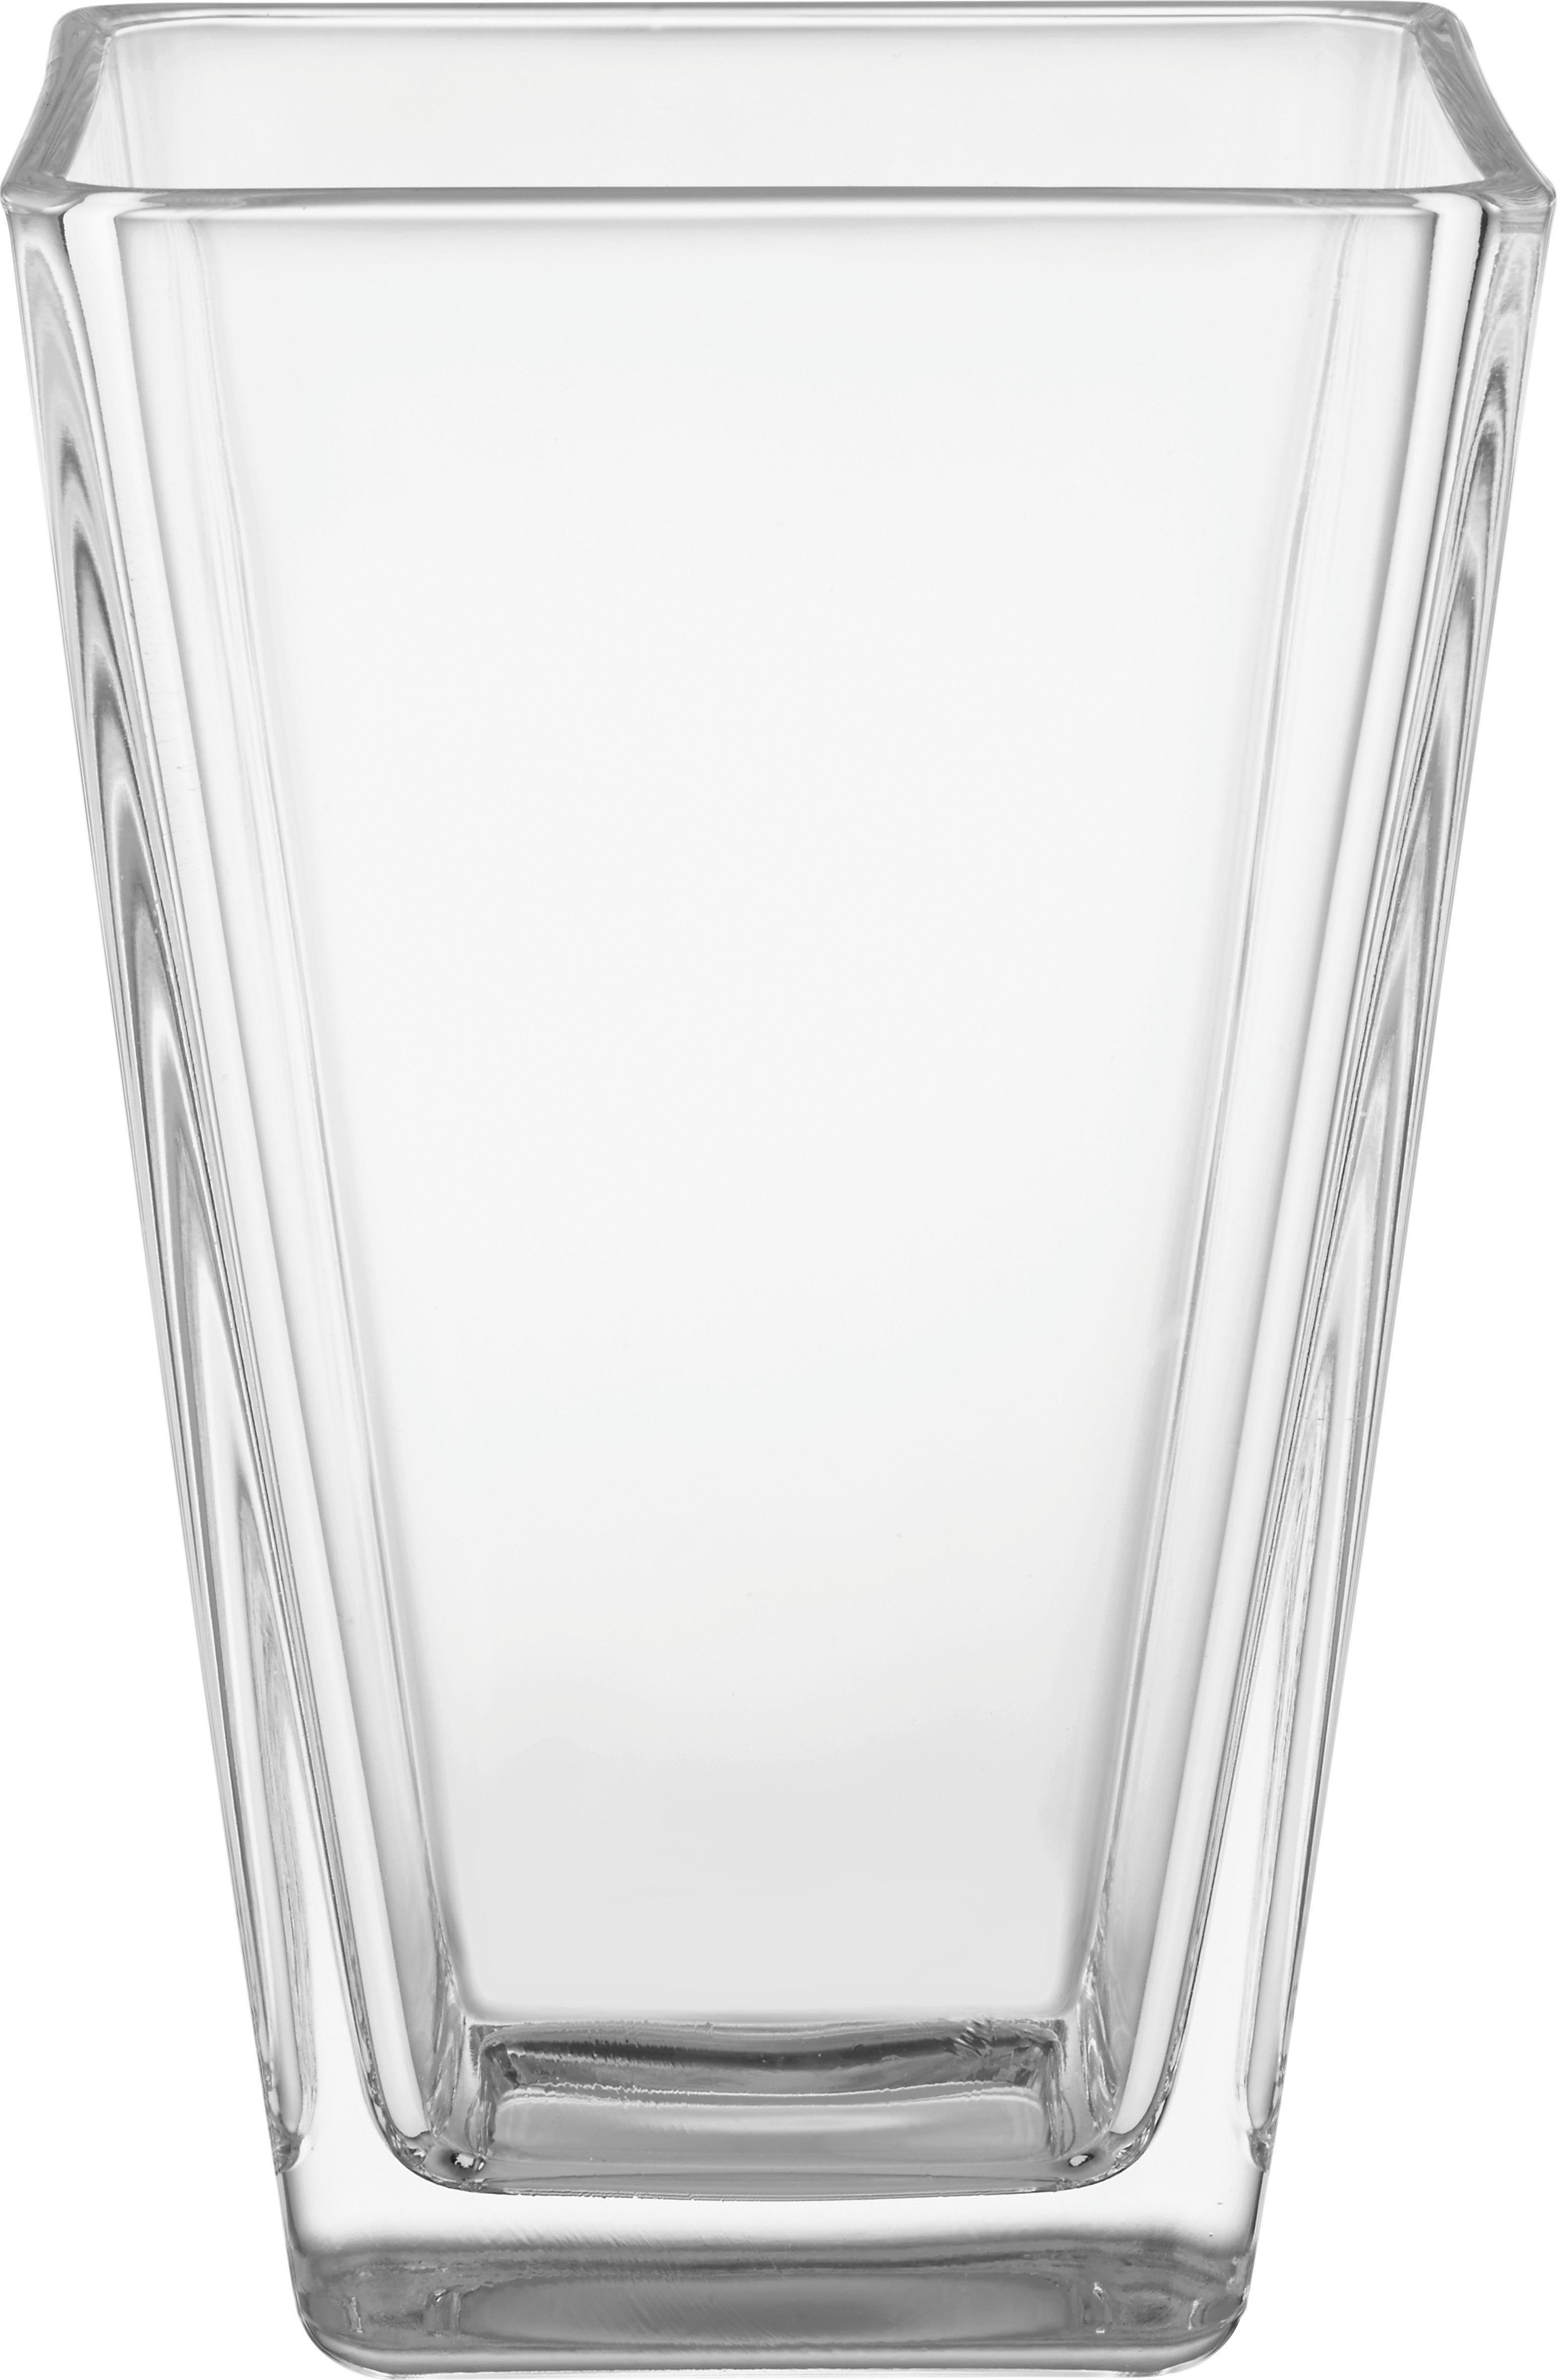 Vase Mona aus Glas - Klar, MODERN, Glas (11/17/11cm) - BASED